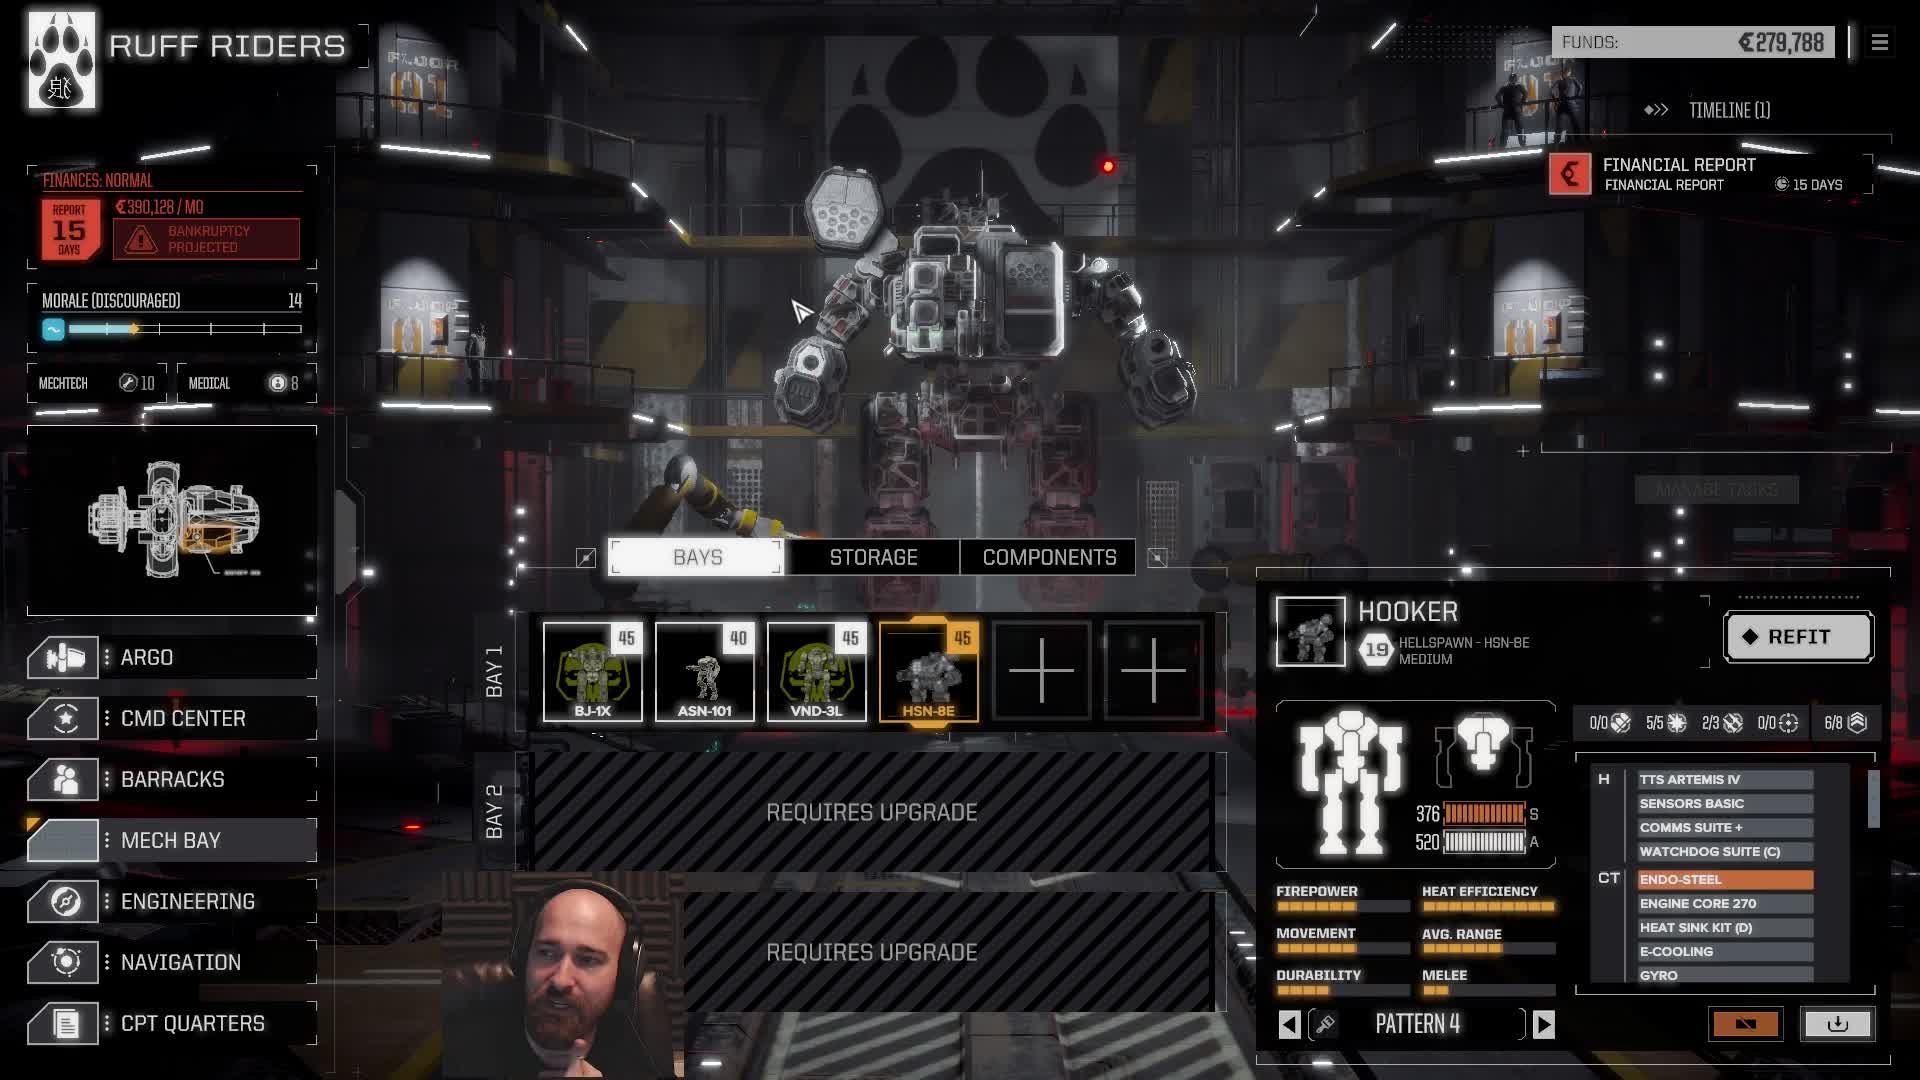 Arumba07 - (Feb 17) Battletech with RogueTech (and drinking